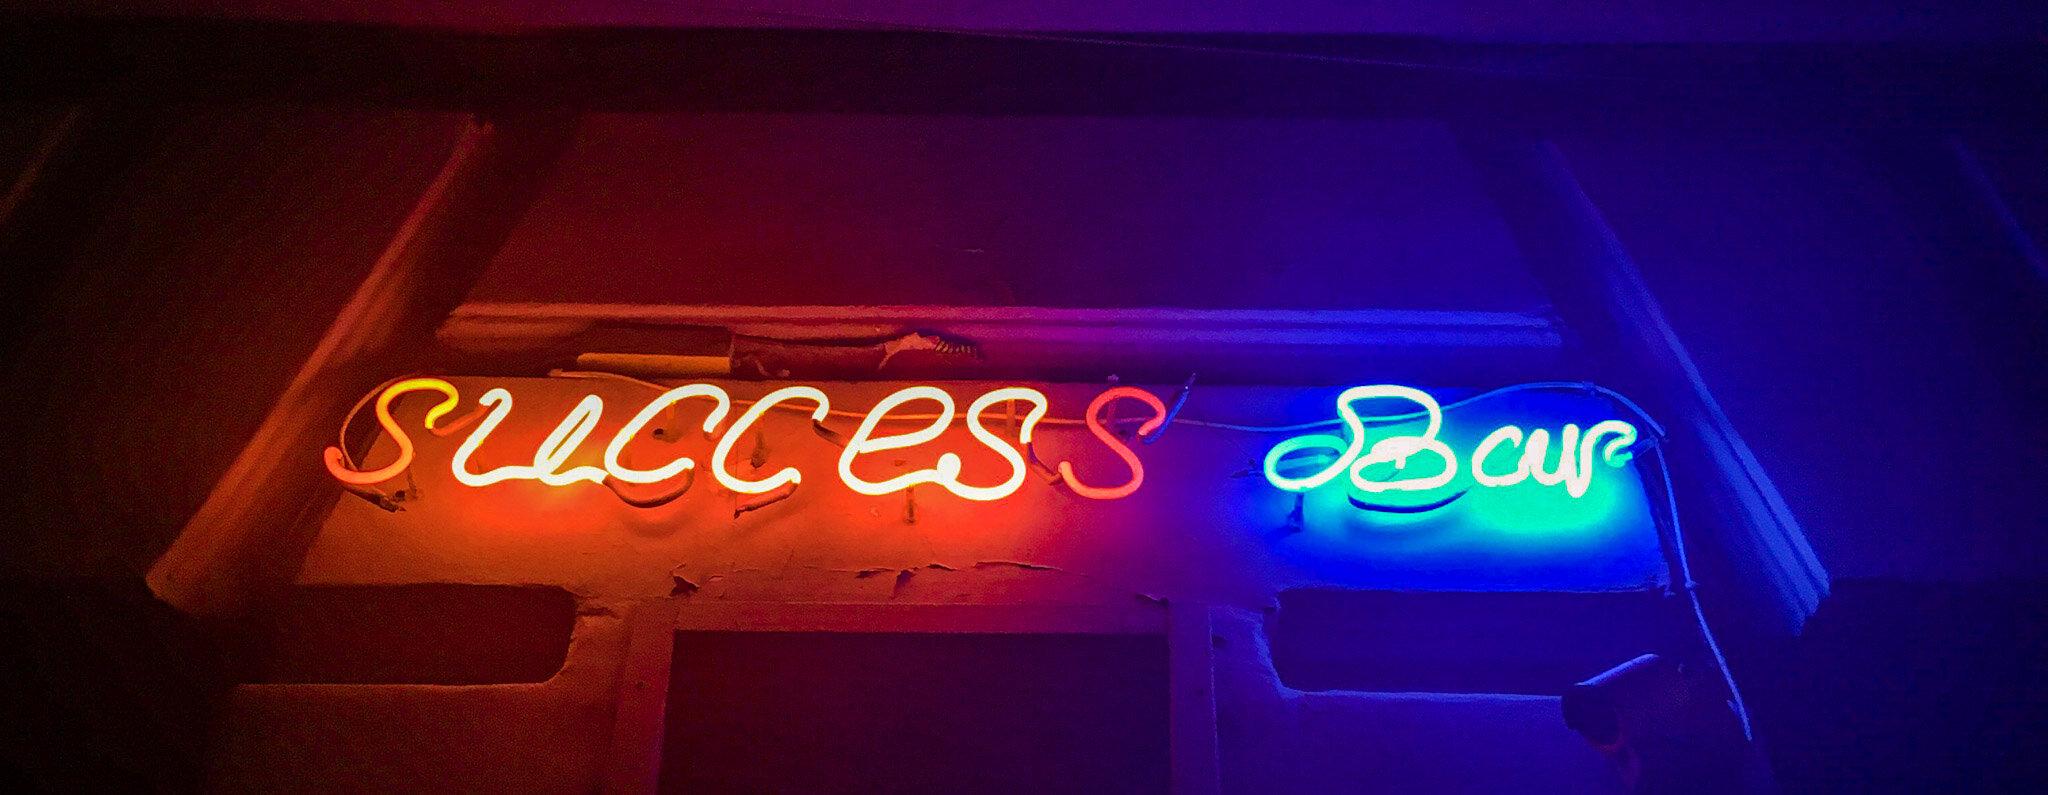 tbilisi-success-gay-bar.jpg